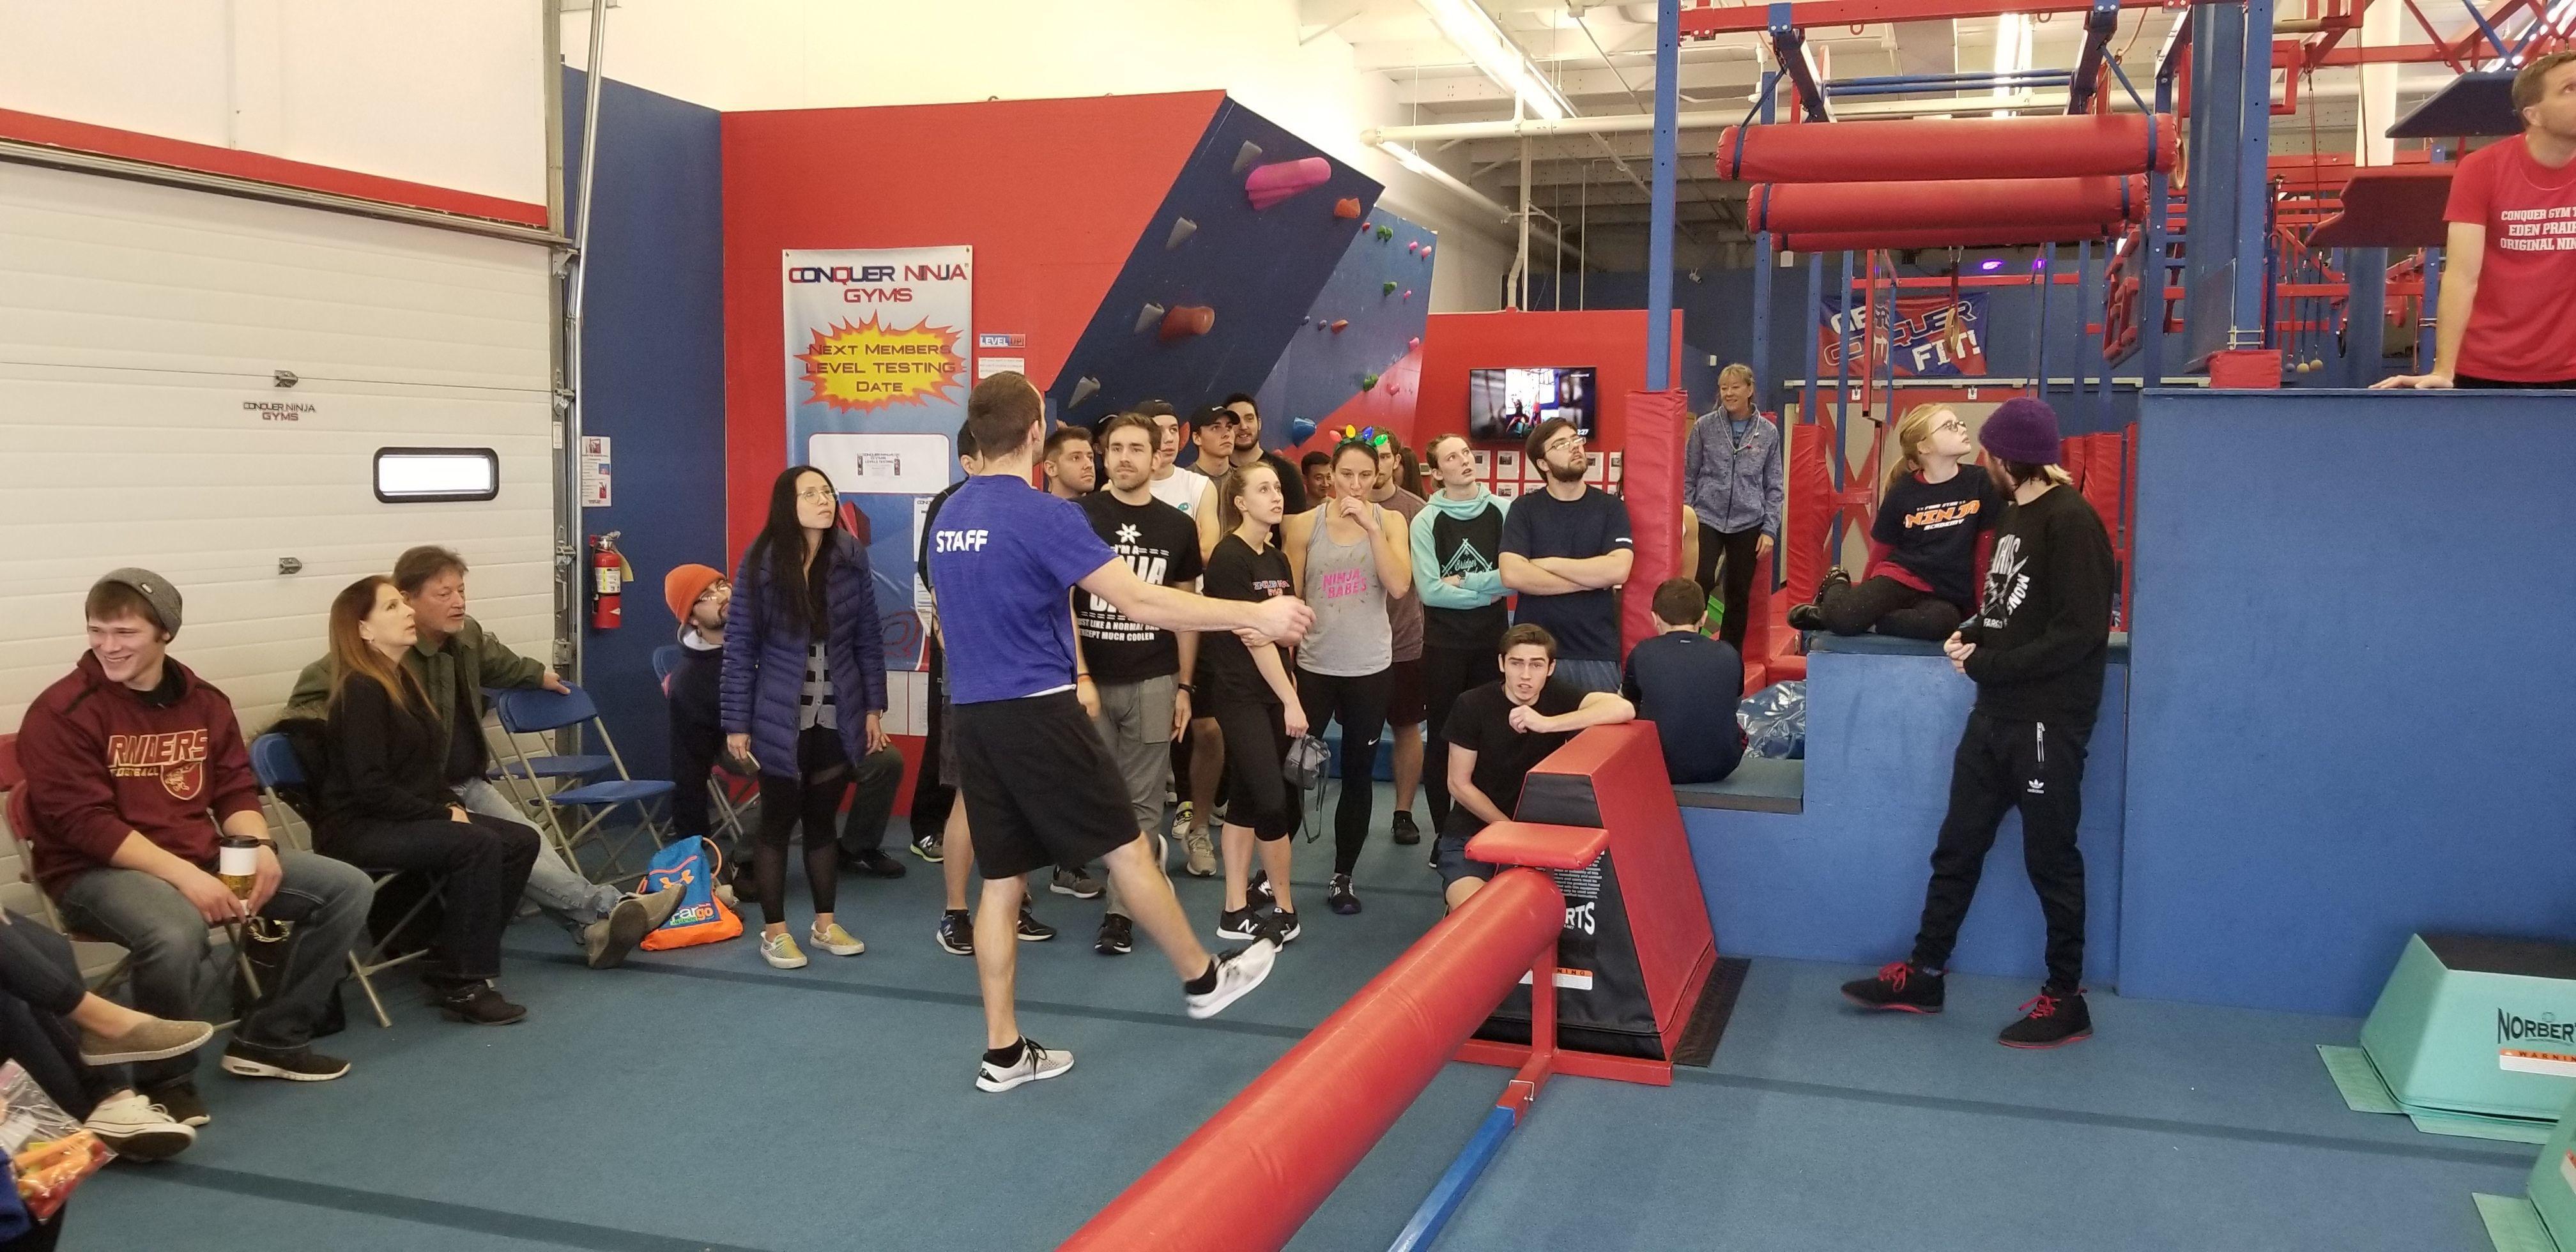 Conquer Ninja Gym Summer Camps Fargo Nd Camp Dates Availability Activityhero